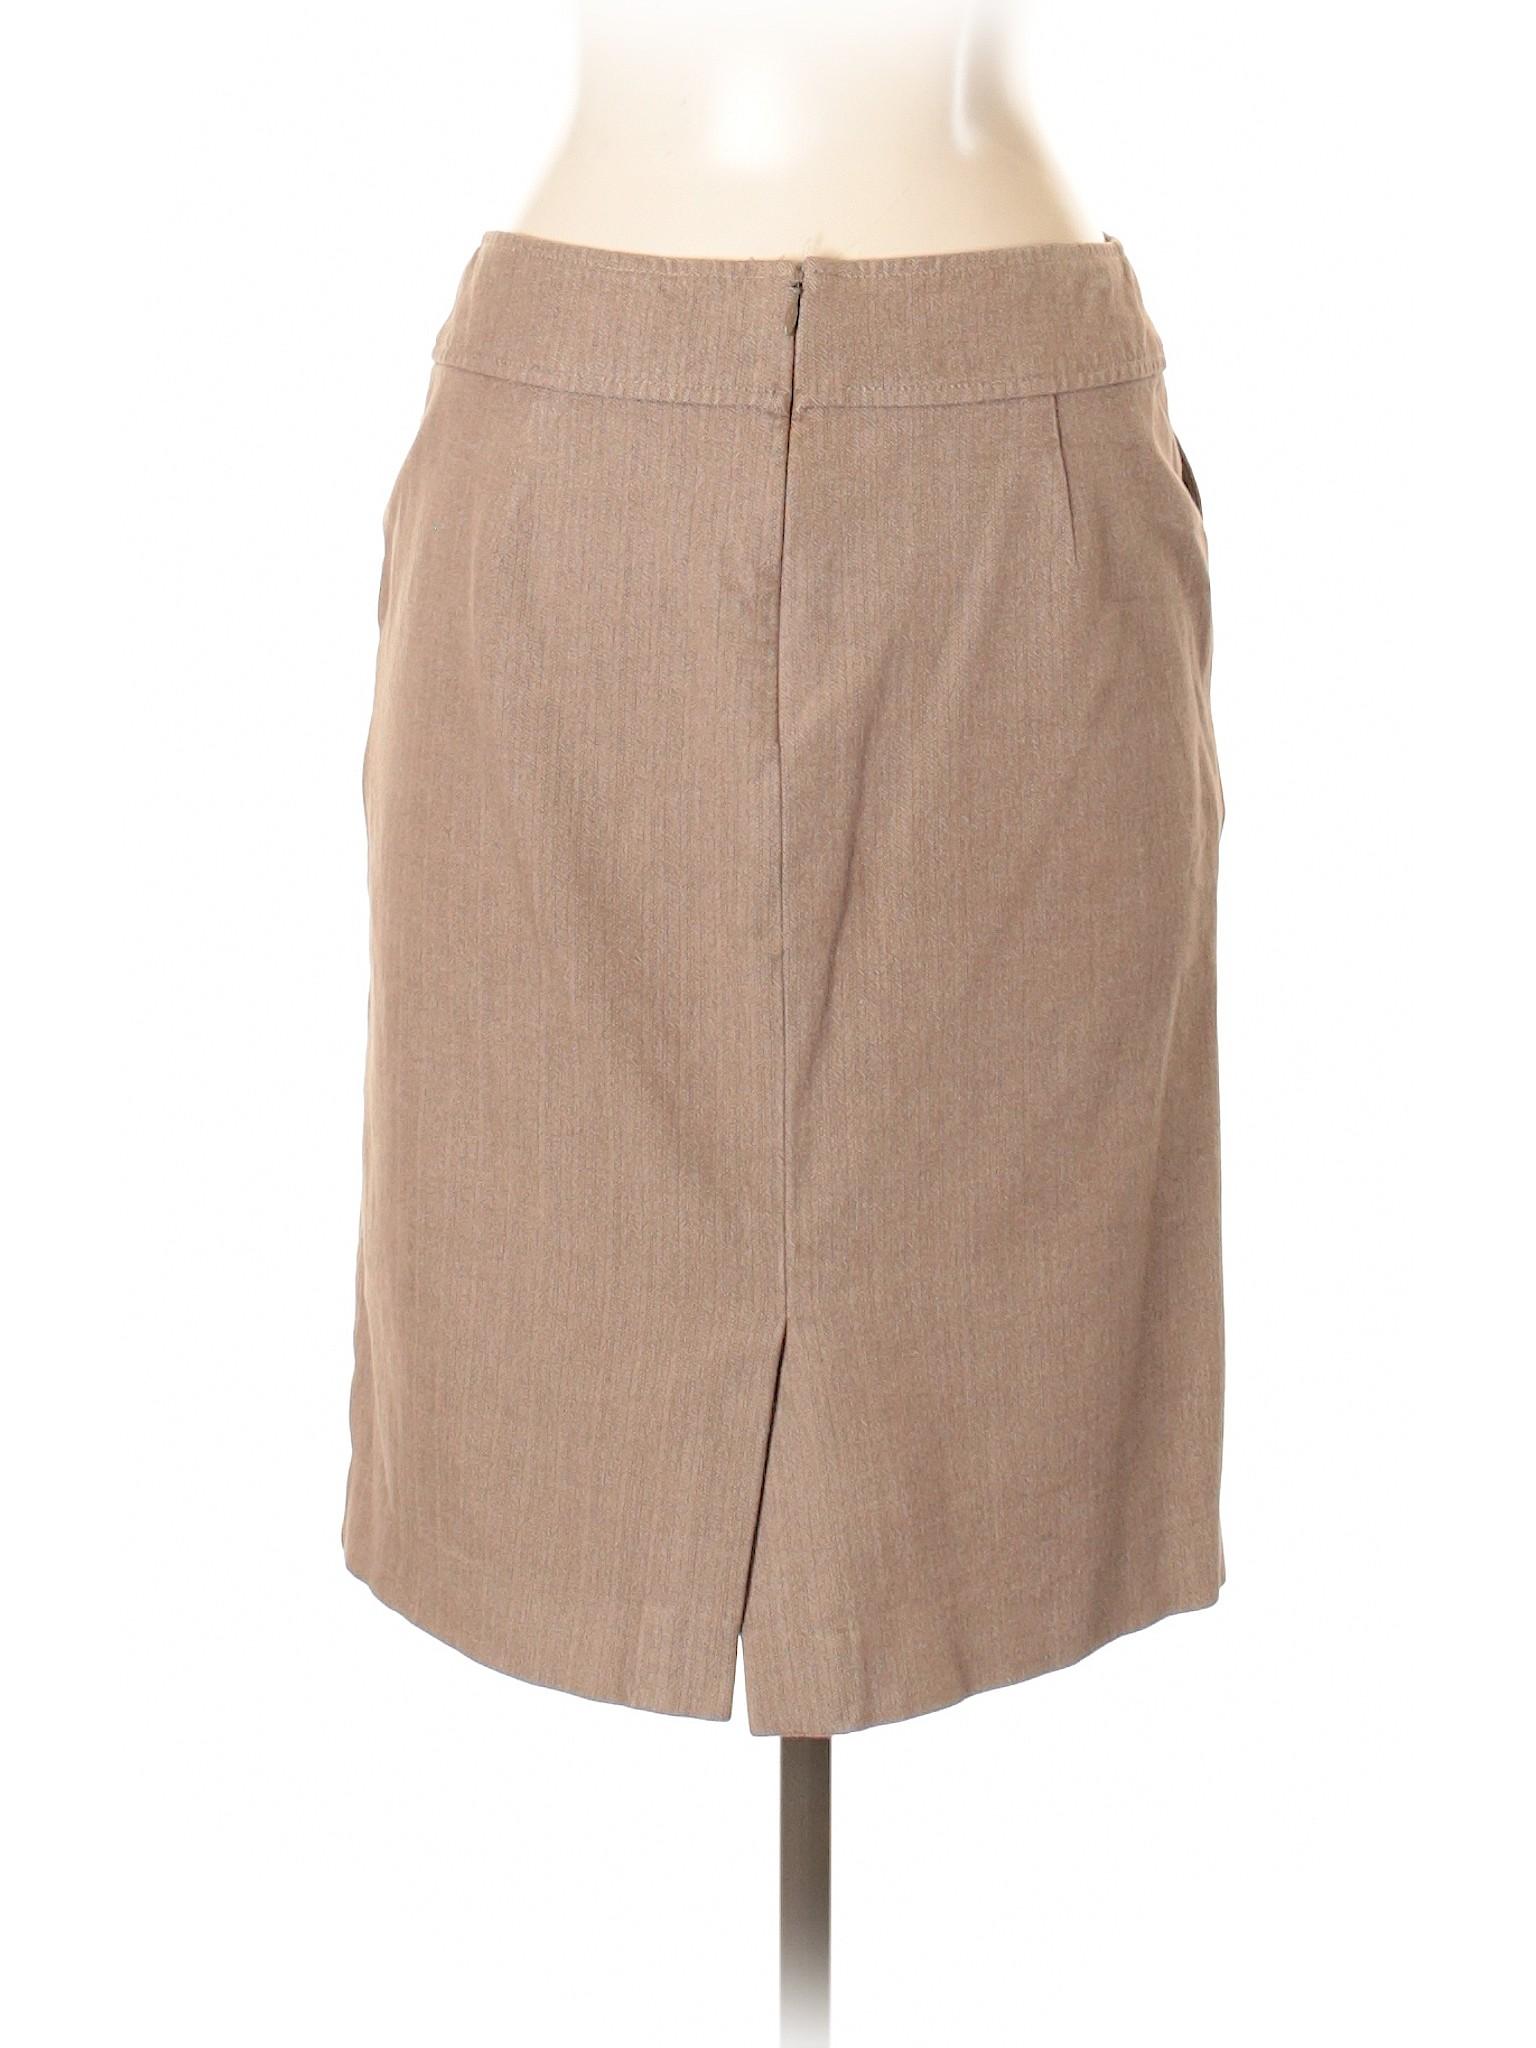 Banana Boutique Republic Casual Skirt leisure 5qOTqwR